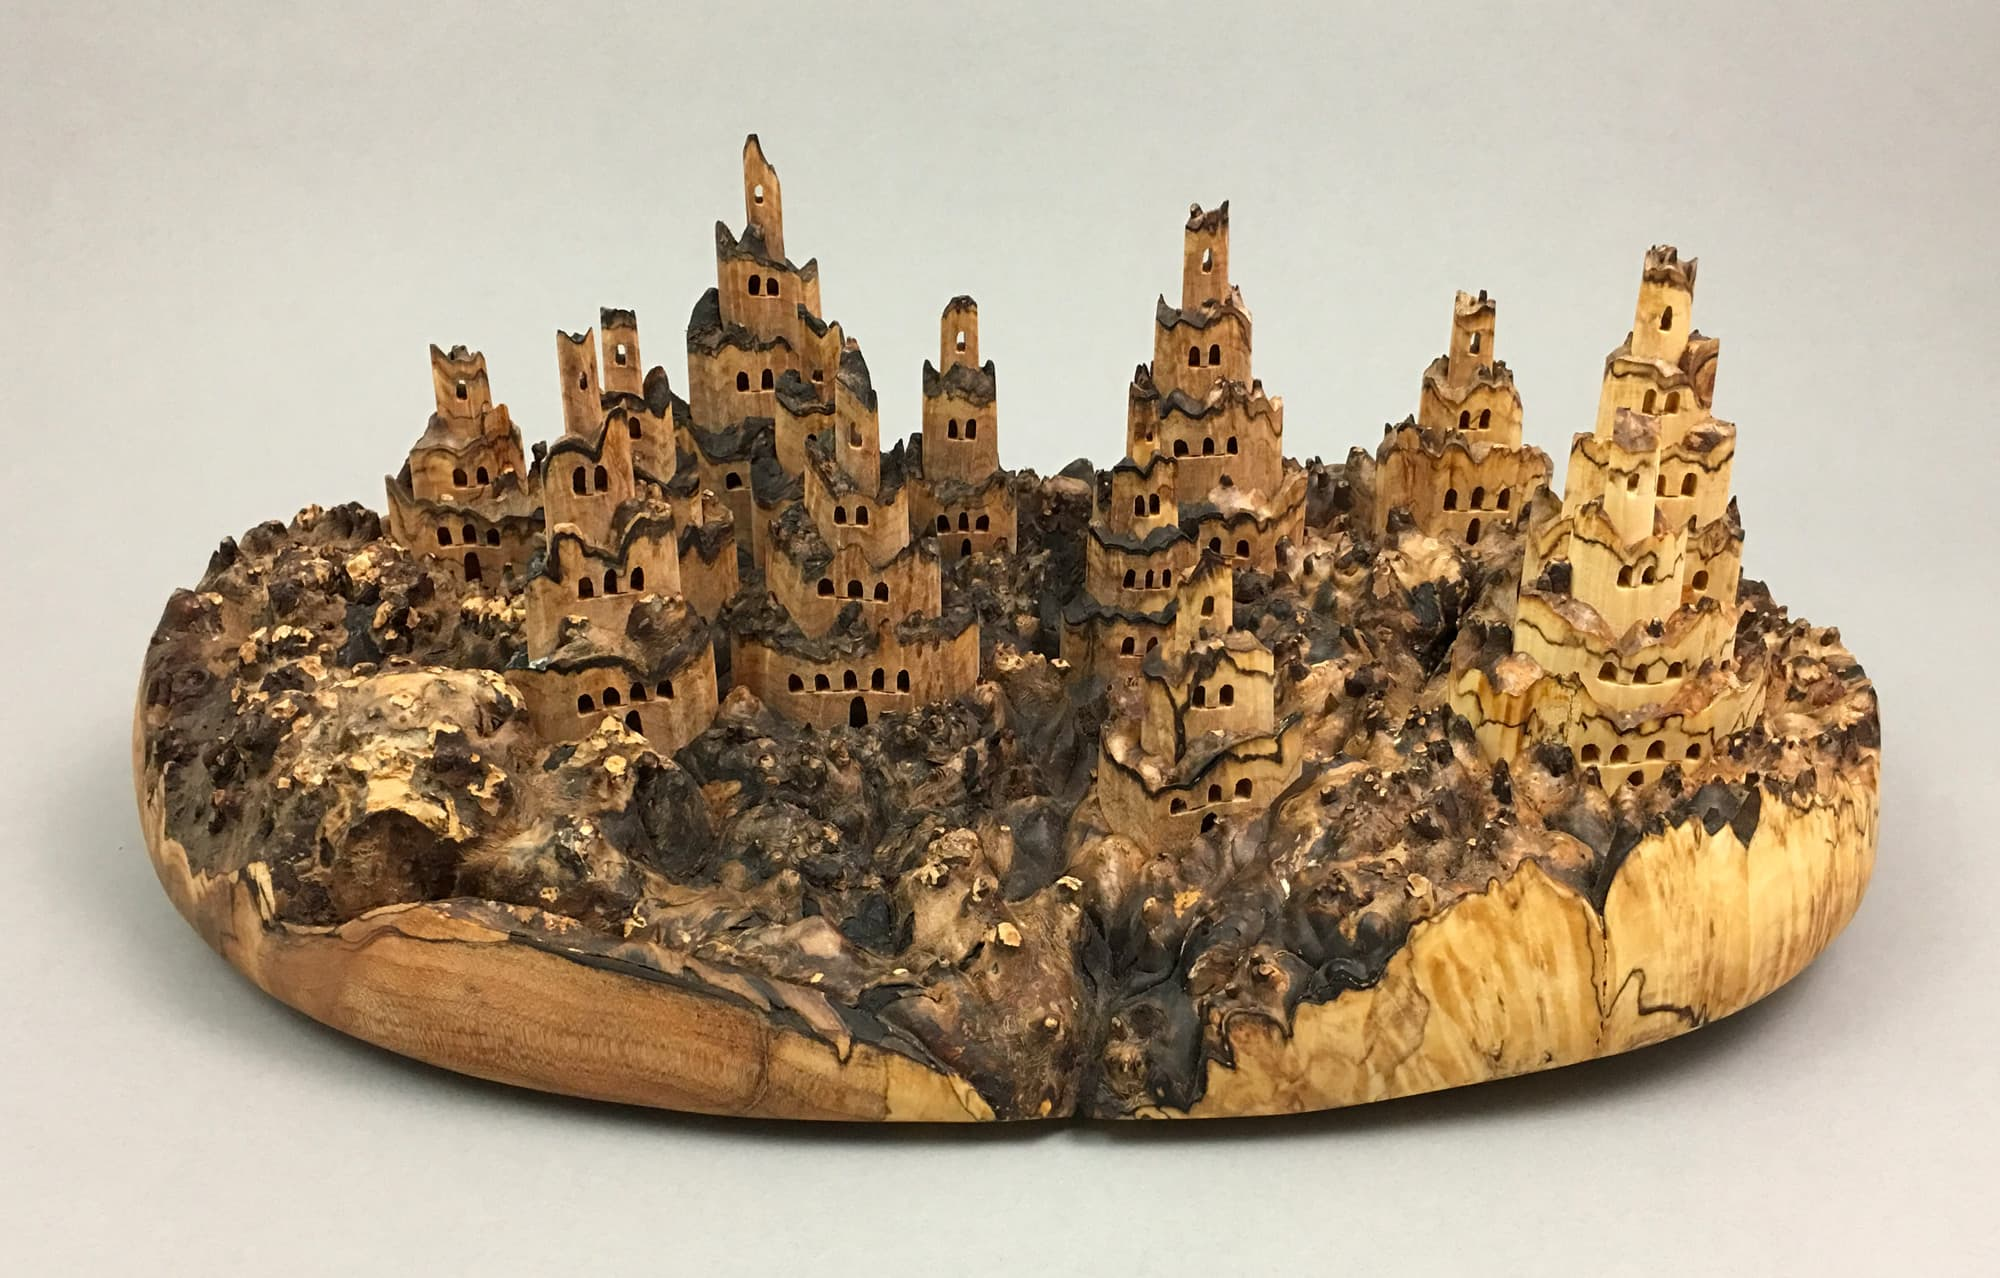 Uli Kirchler - Very Hidden Castles Holz-Skulpturen